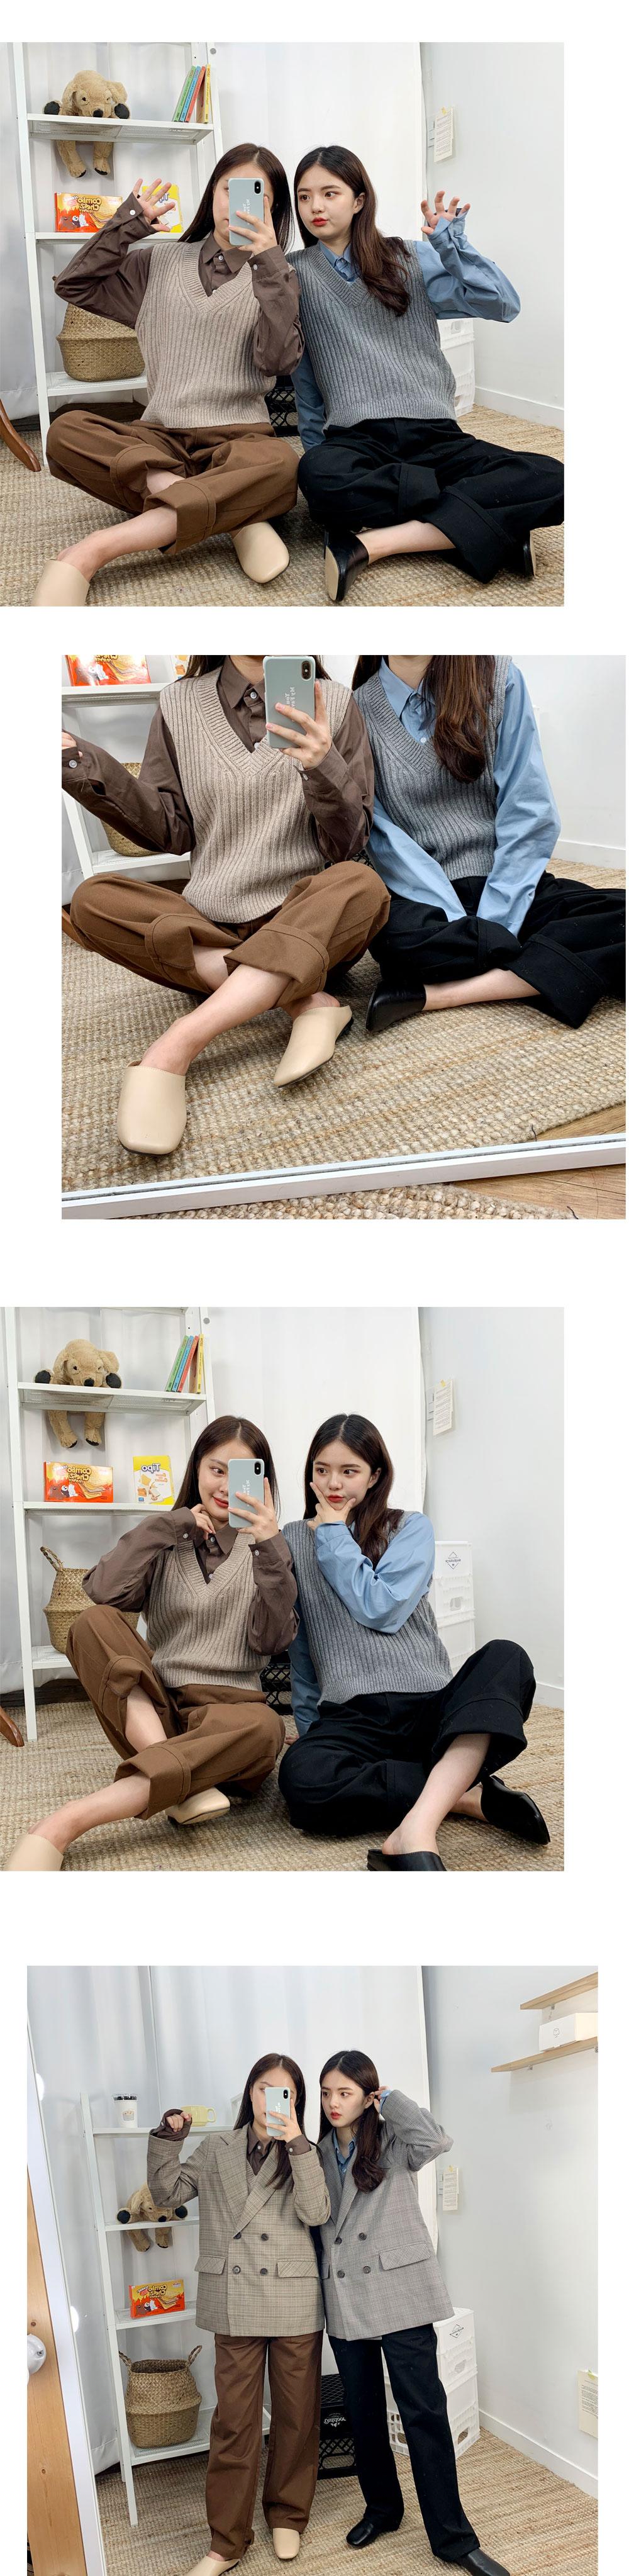 ☆ Nojinjin special price ☆ Bijo cotton straight pants